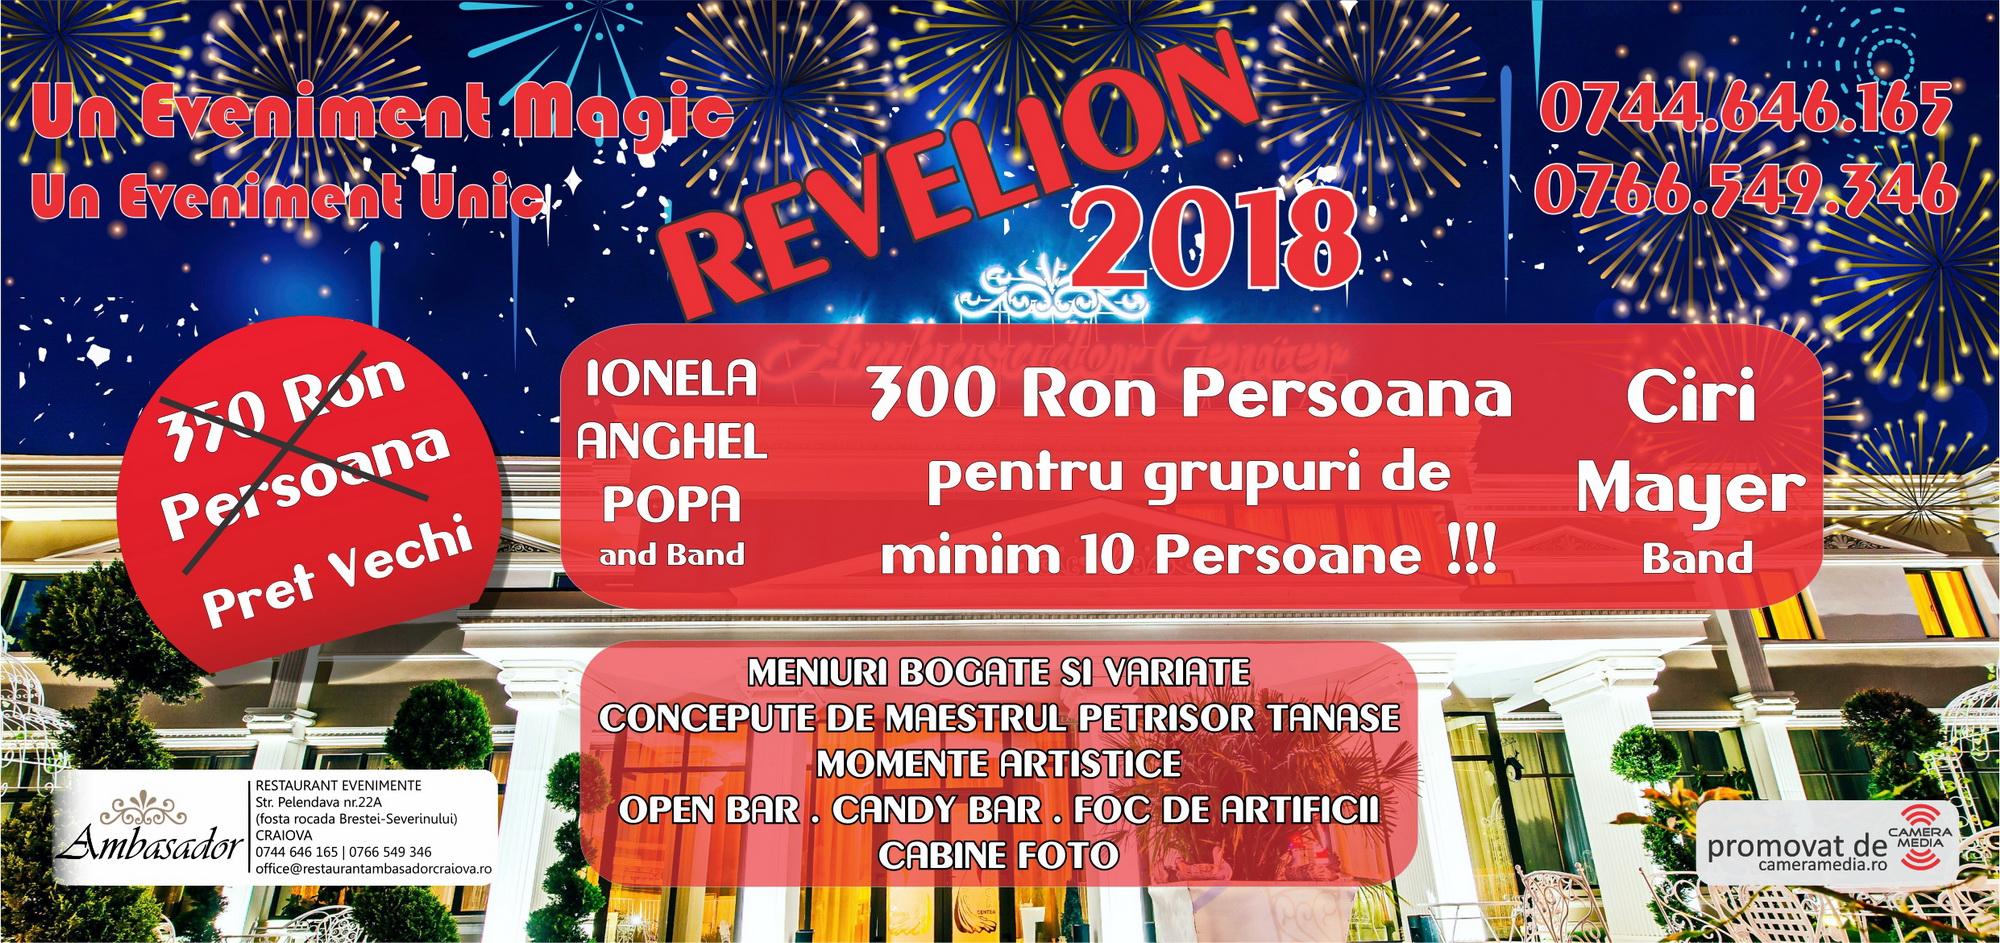 Meniu Revelion 2018 Craiova | Restaurant Nunta, Botez, Corporate, Evenimente Craiova | Ambasador Center Craiova